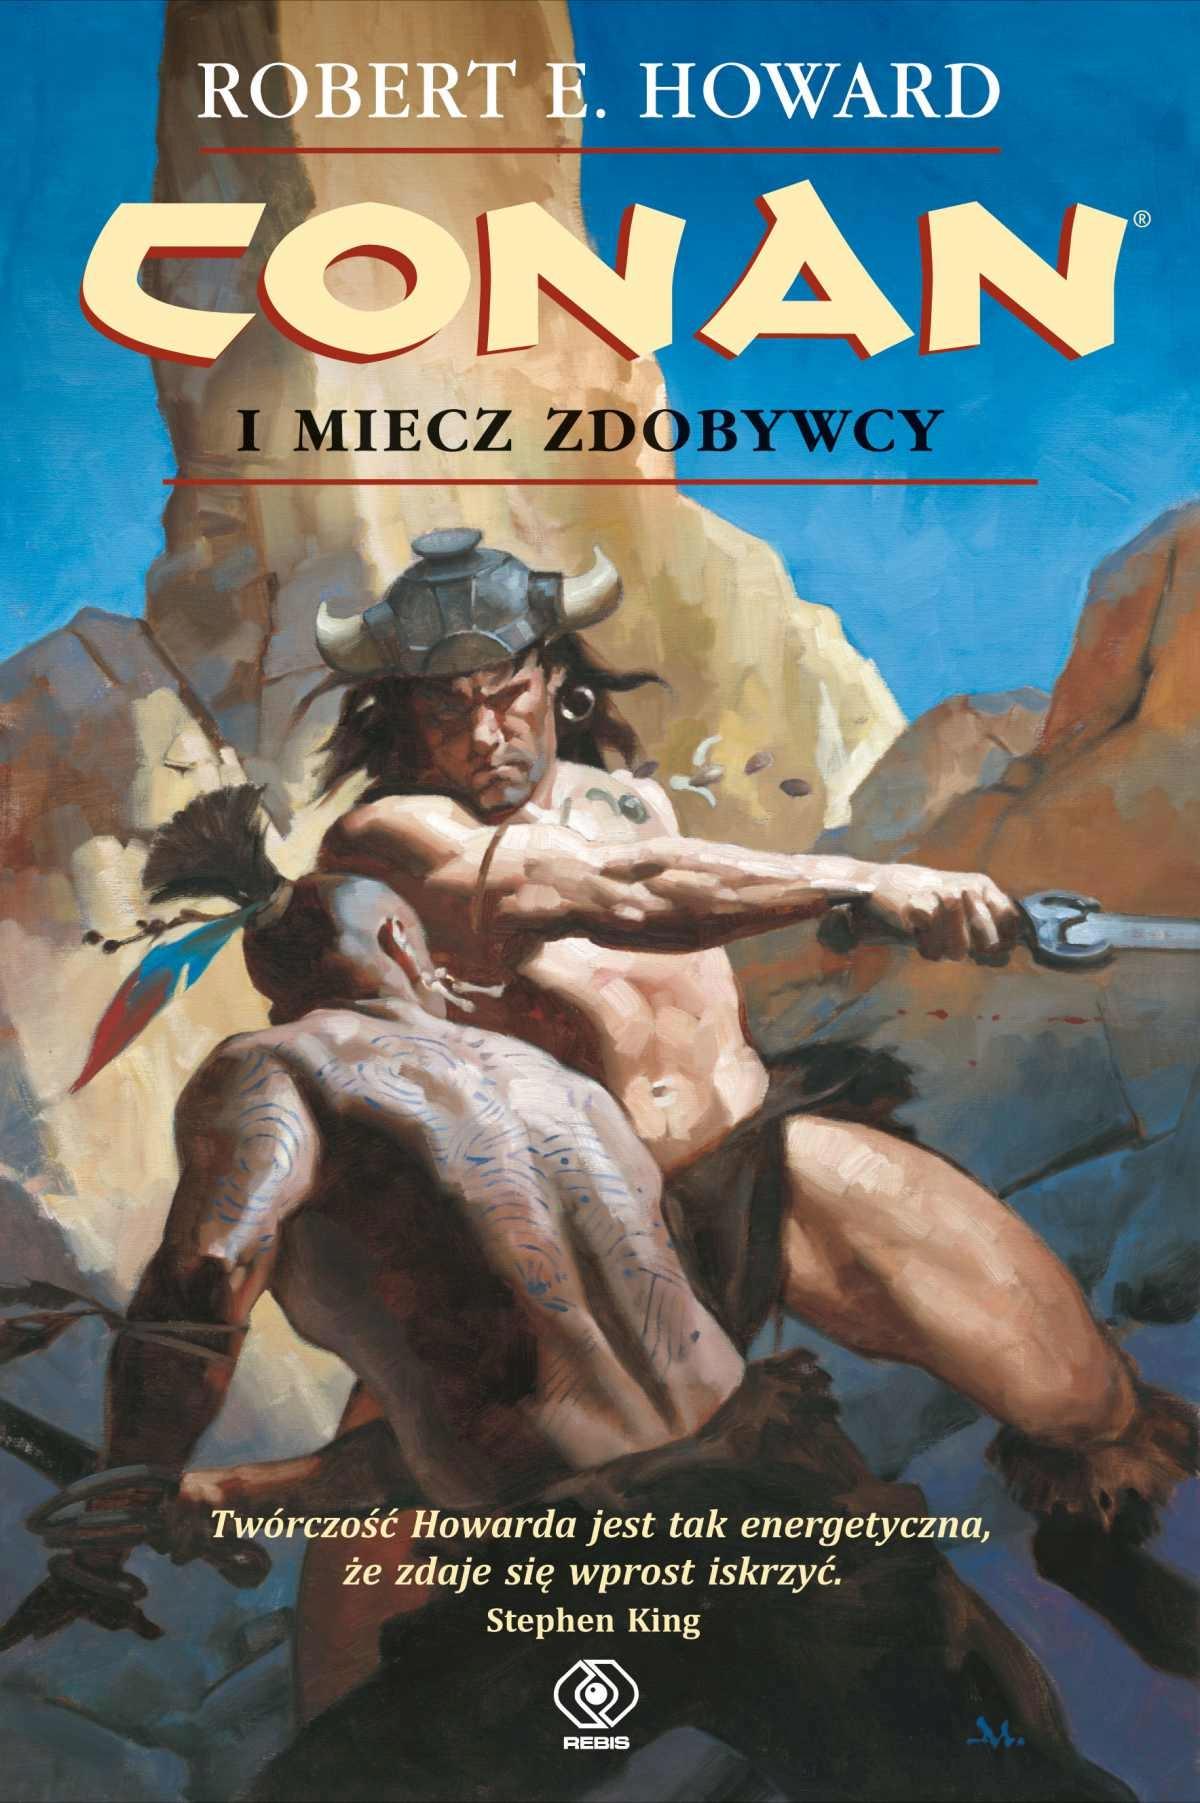 Conan i miecz zdobywcy Robert E. Howard